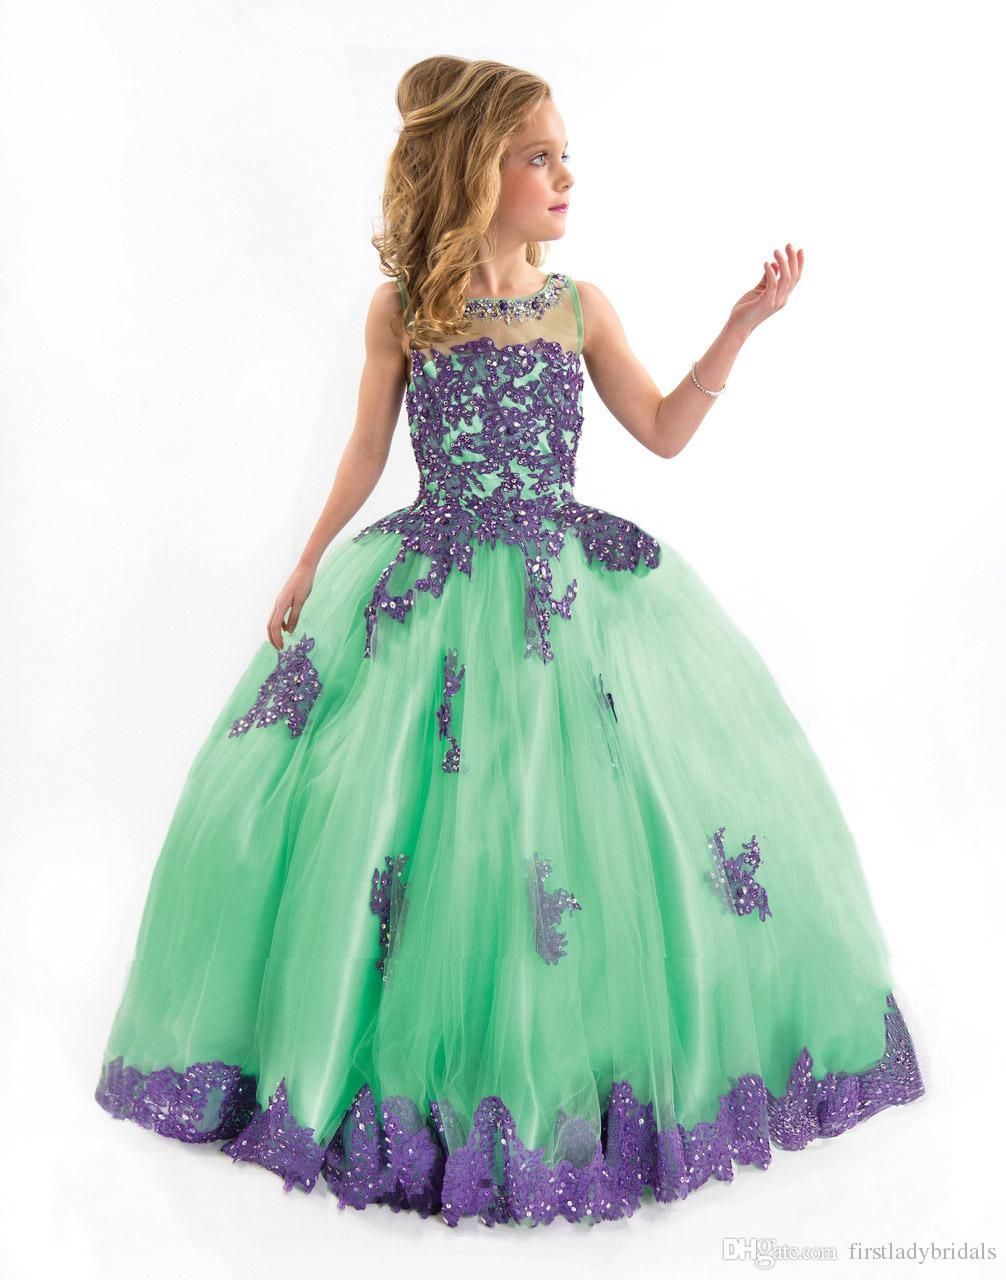 Jade Green Kids Prom Dresses 2016 Halter Neck Beaded Girls Pageant ...